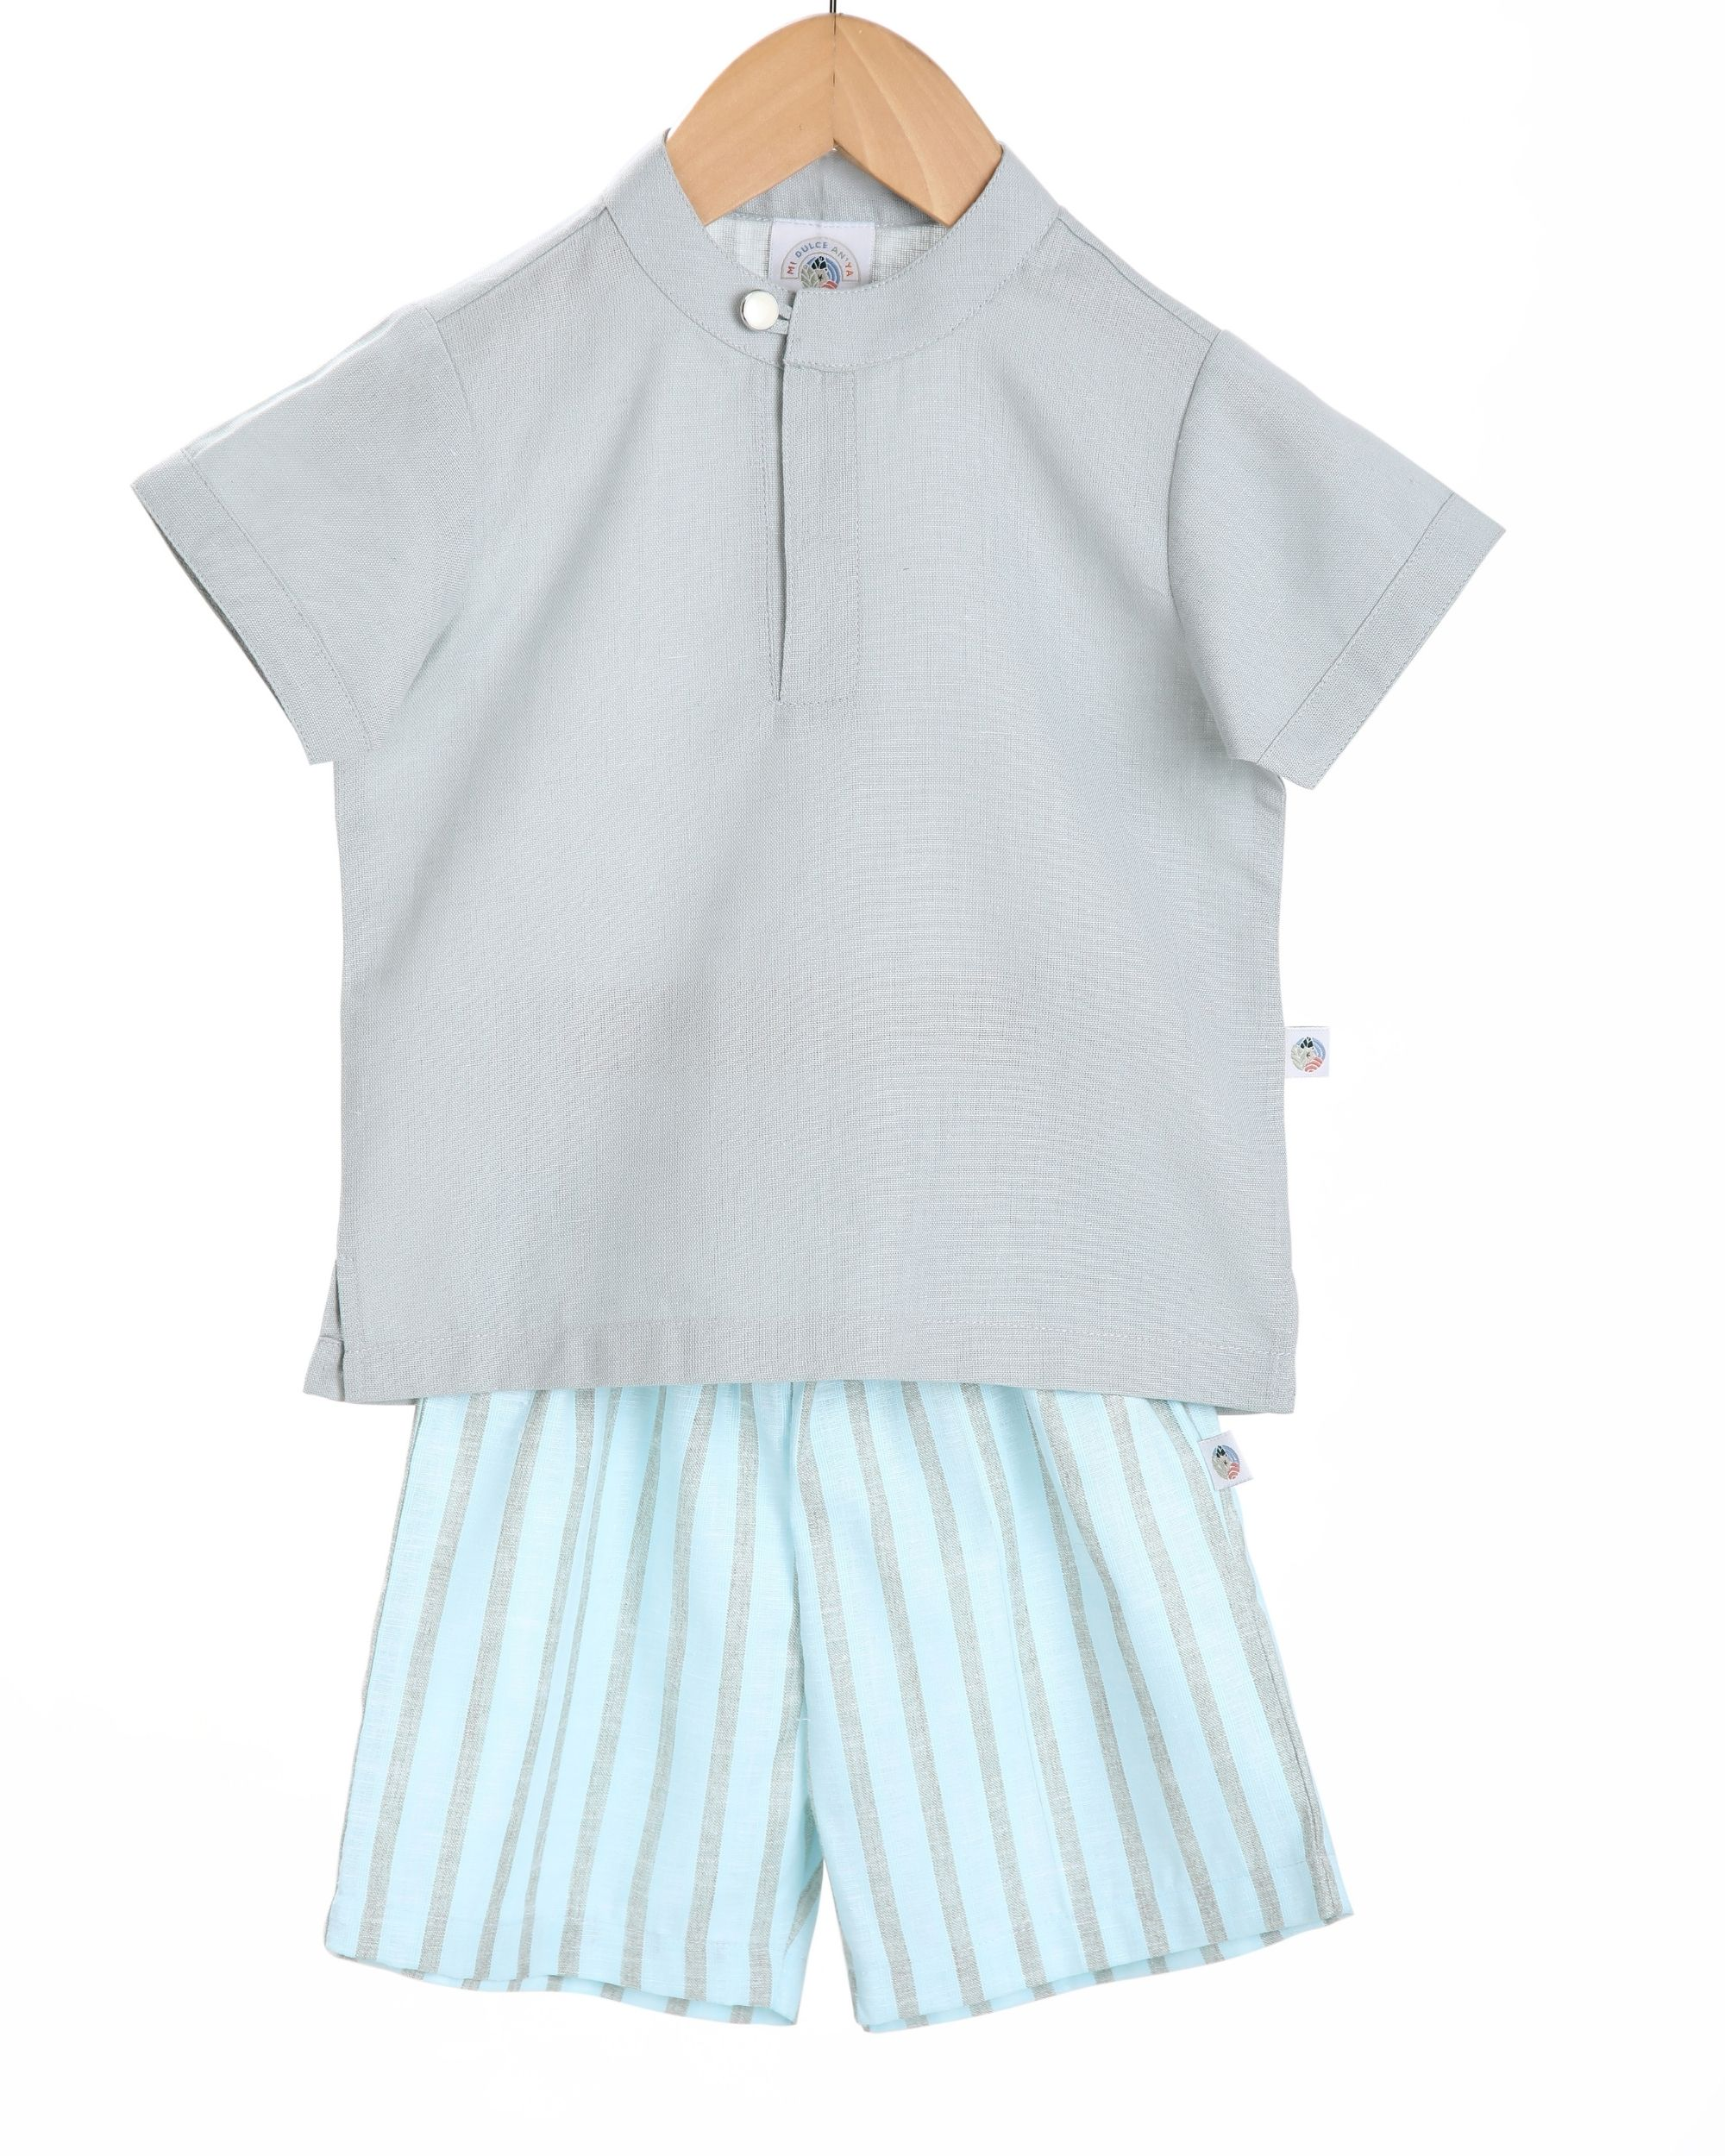 Grey shirt and sky blue striped bermudas shorts - set of two